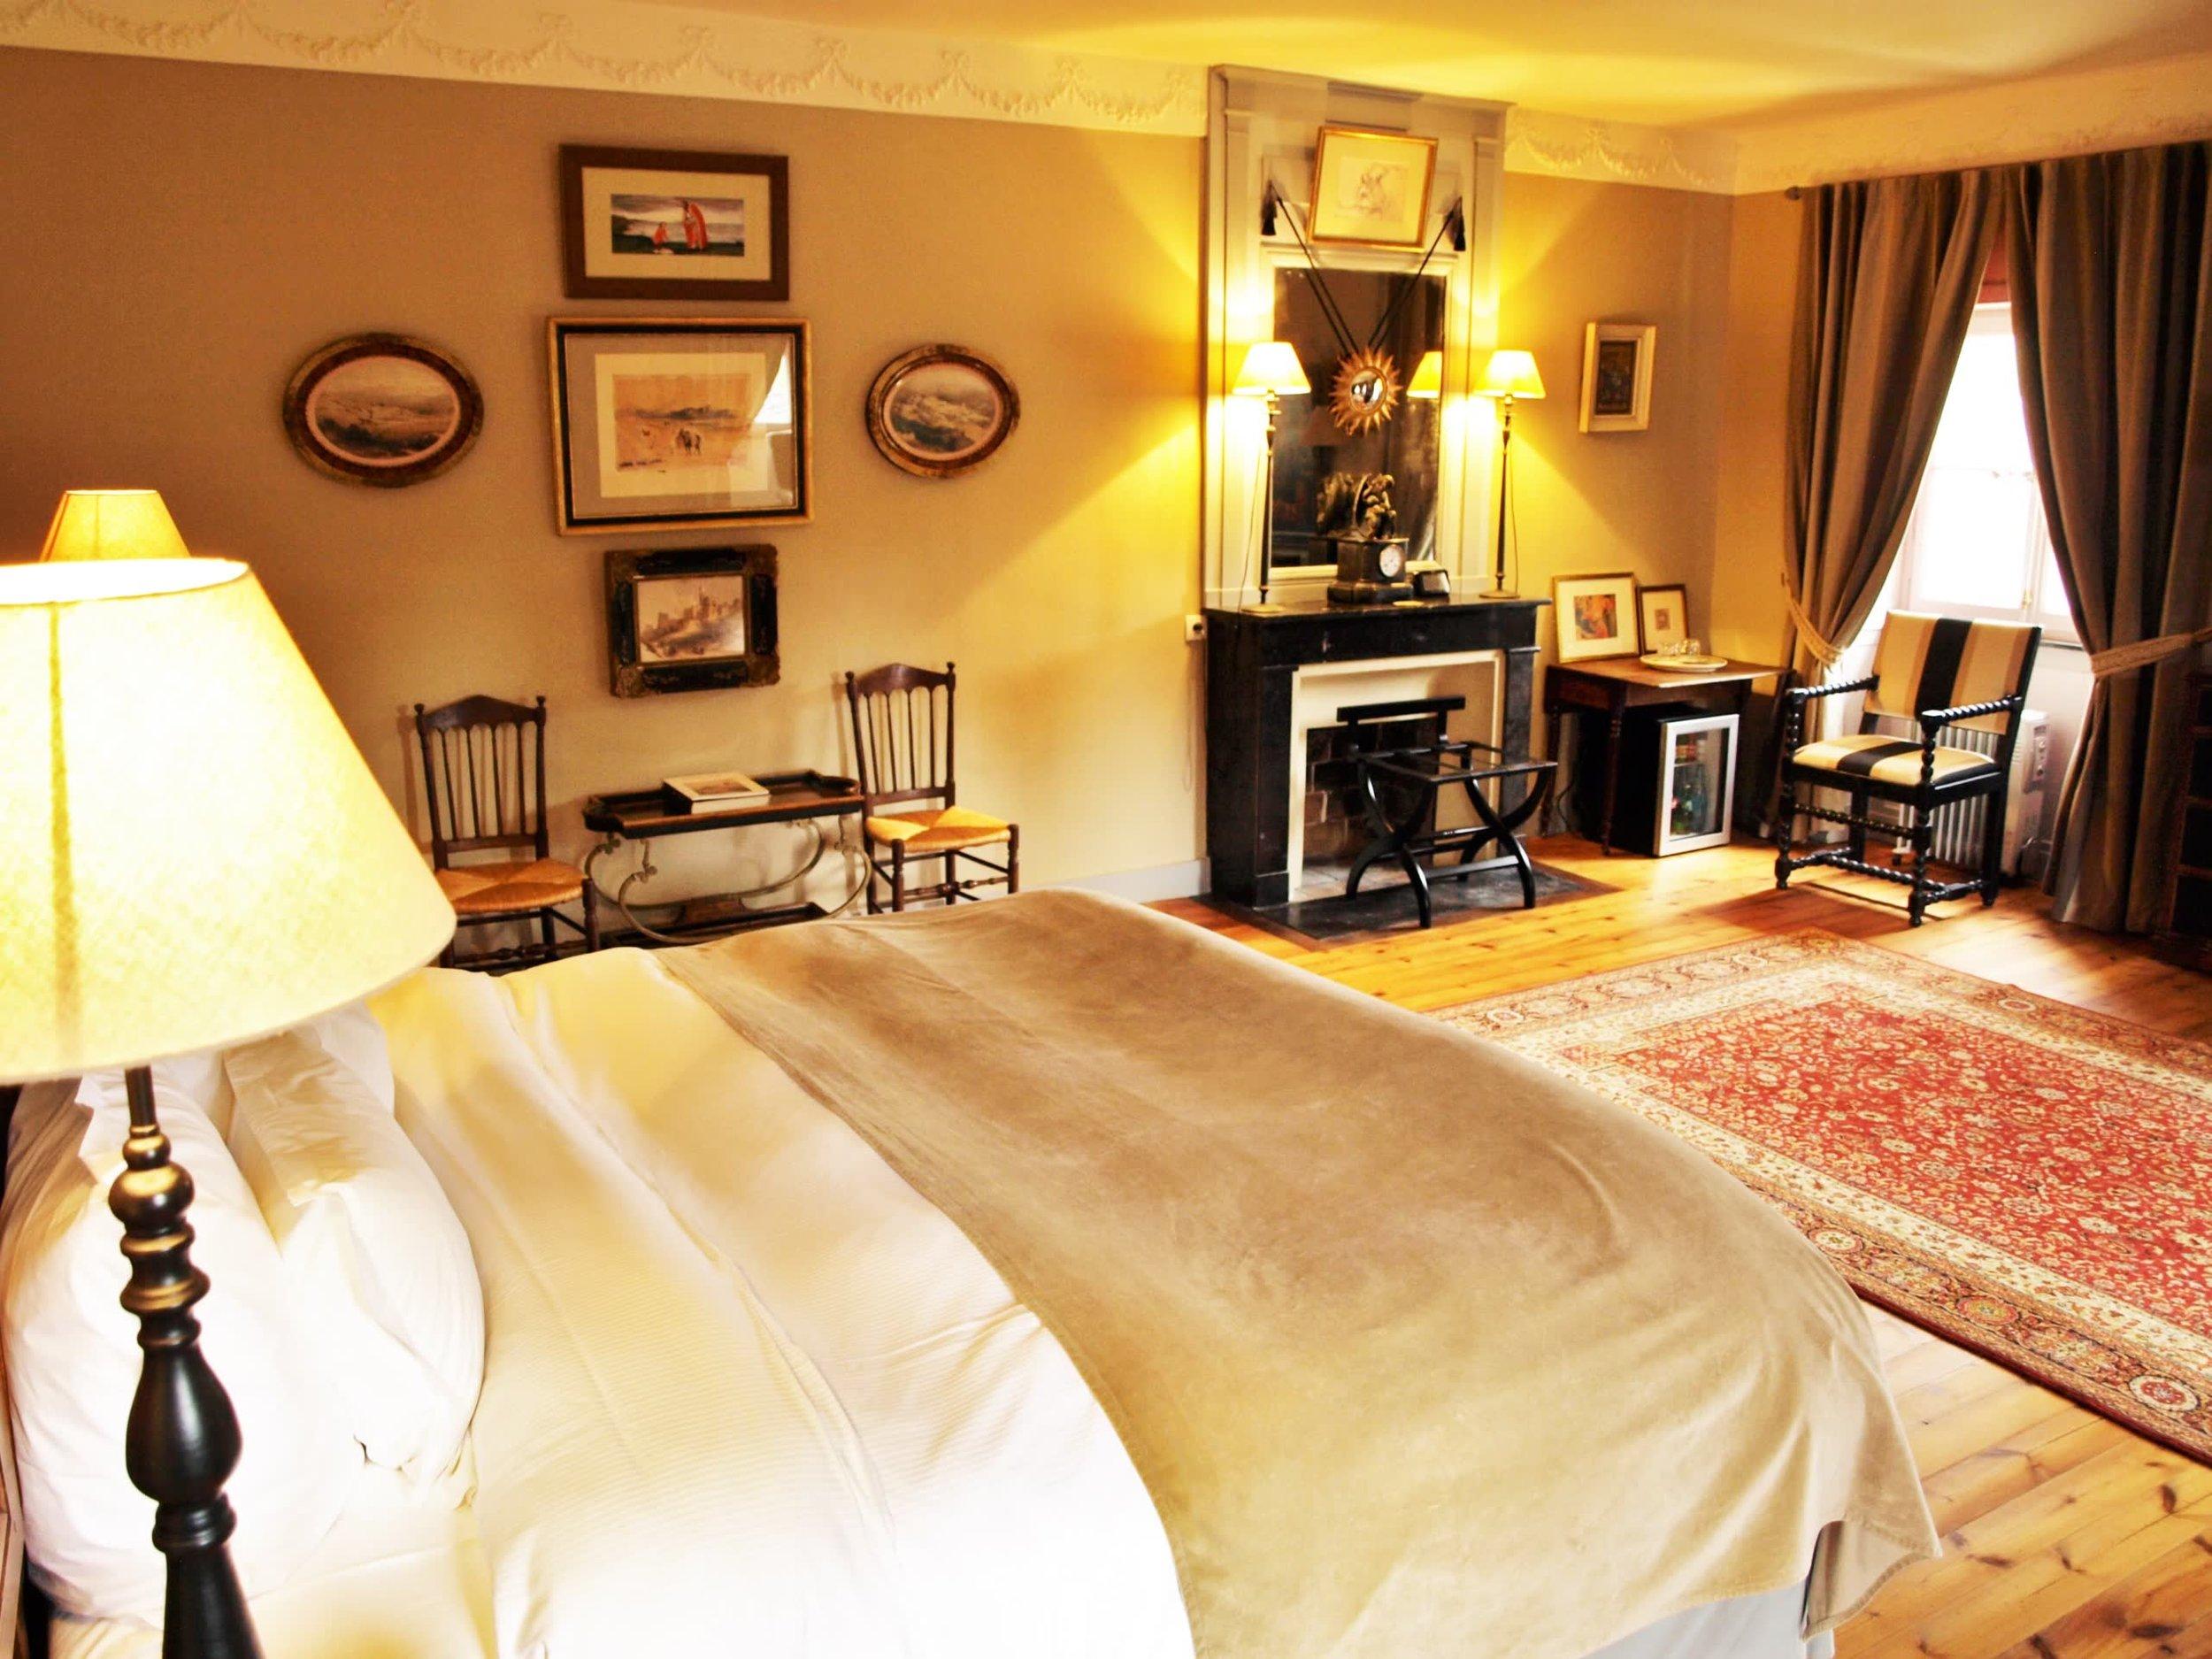 Chateau de la Pommeraye - charming boutique hotel chateau b&b spa normandy calvados bedroom Esquisses 2(2).jpg